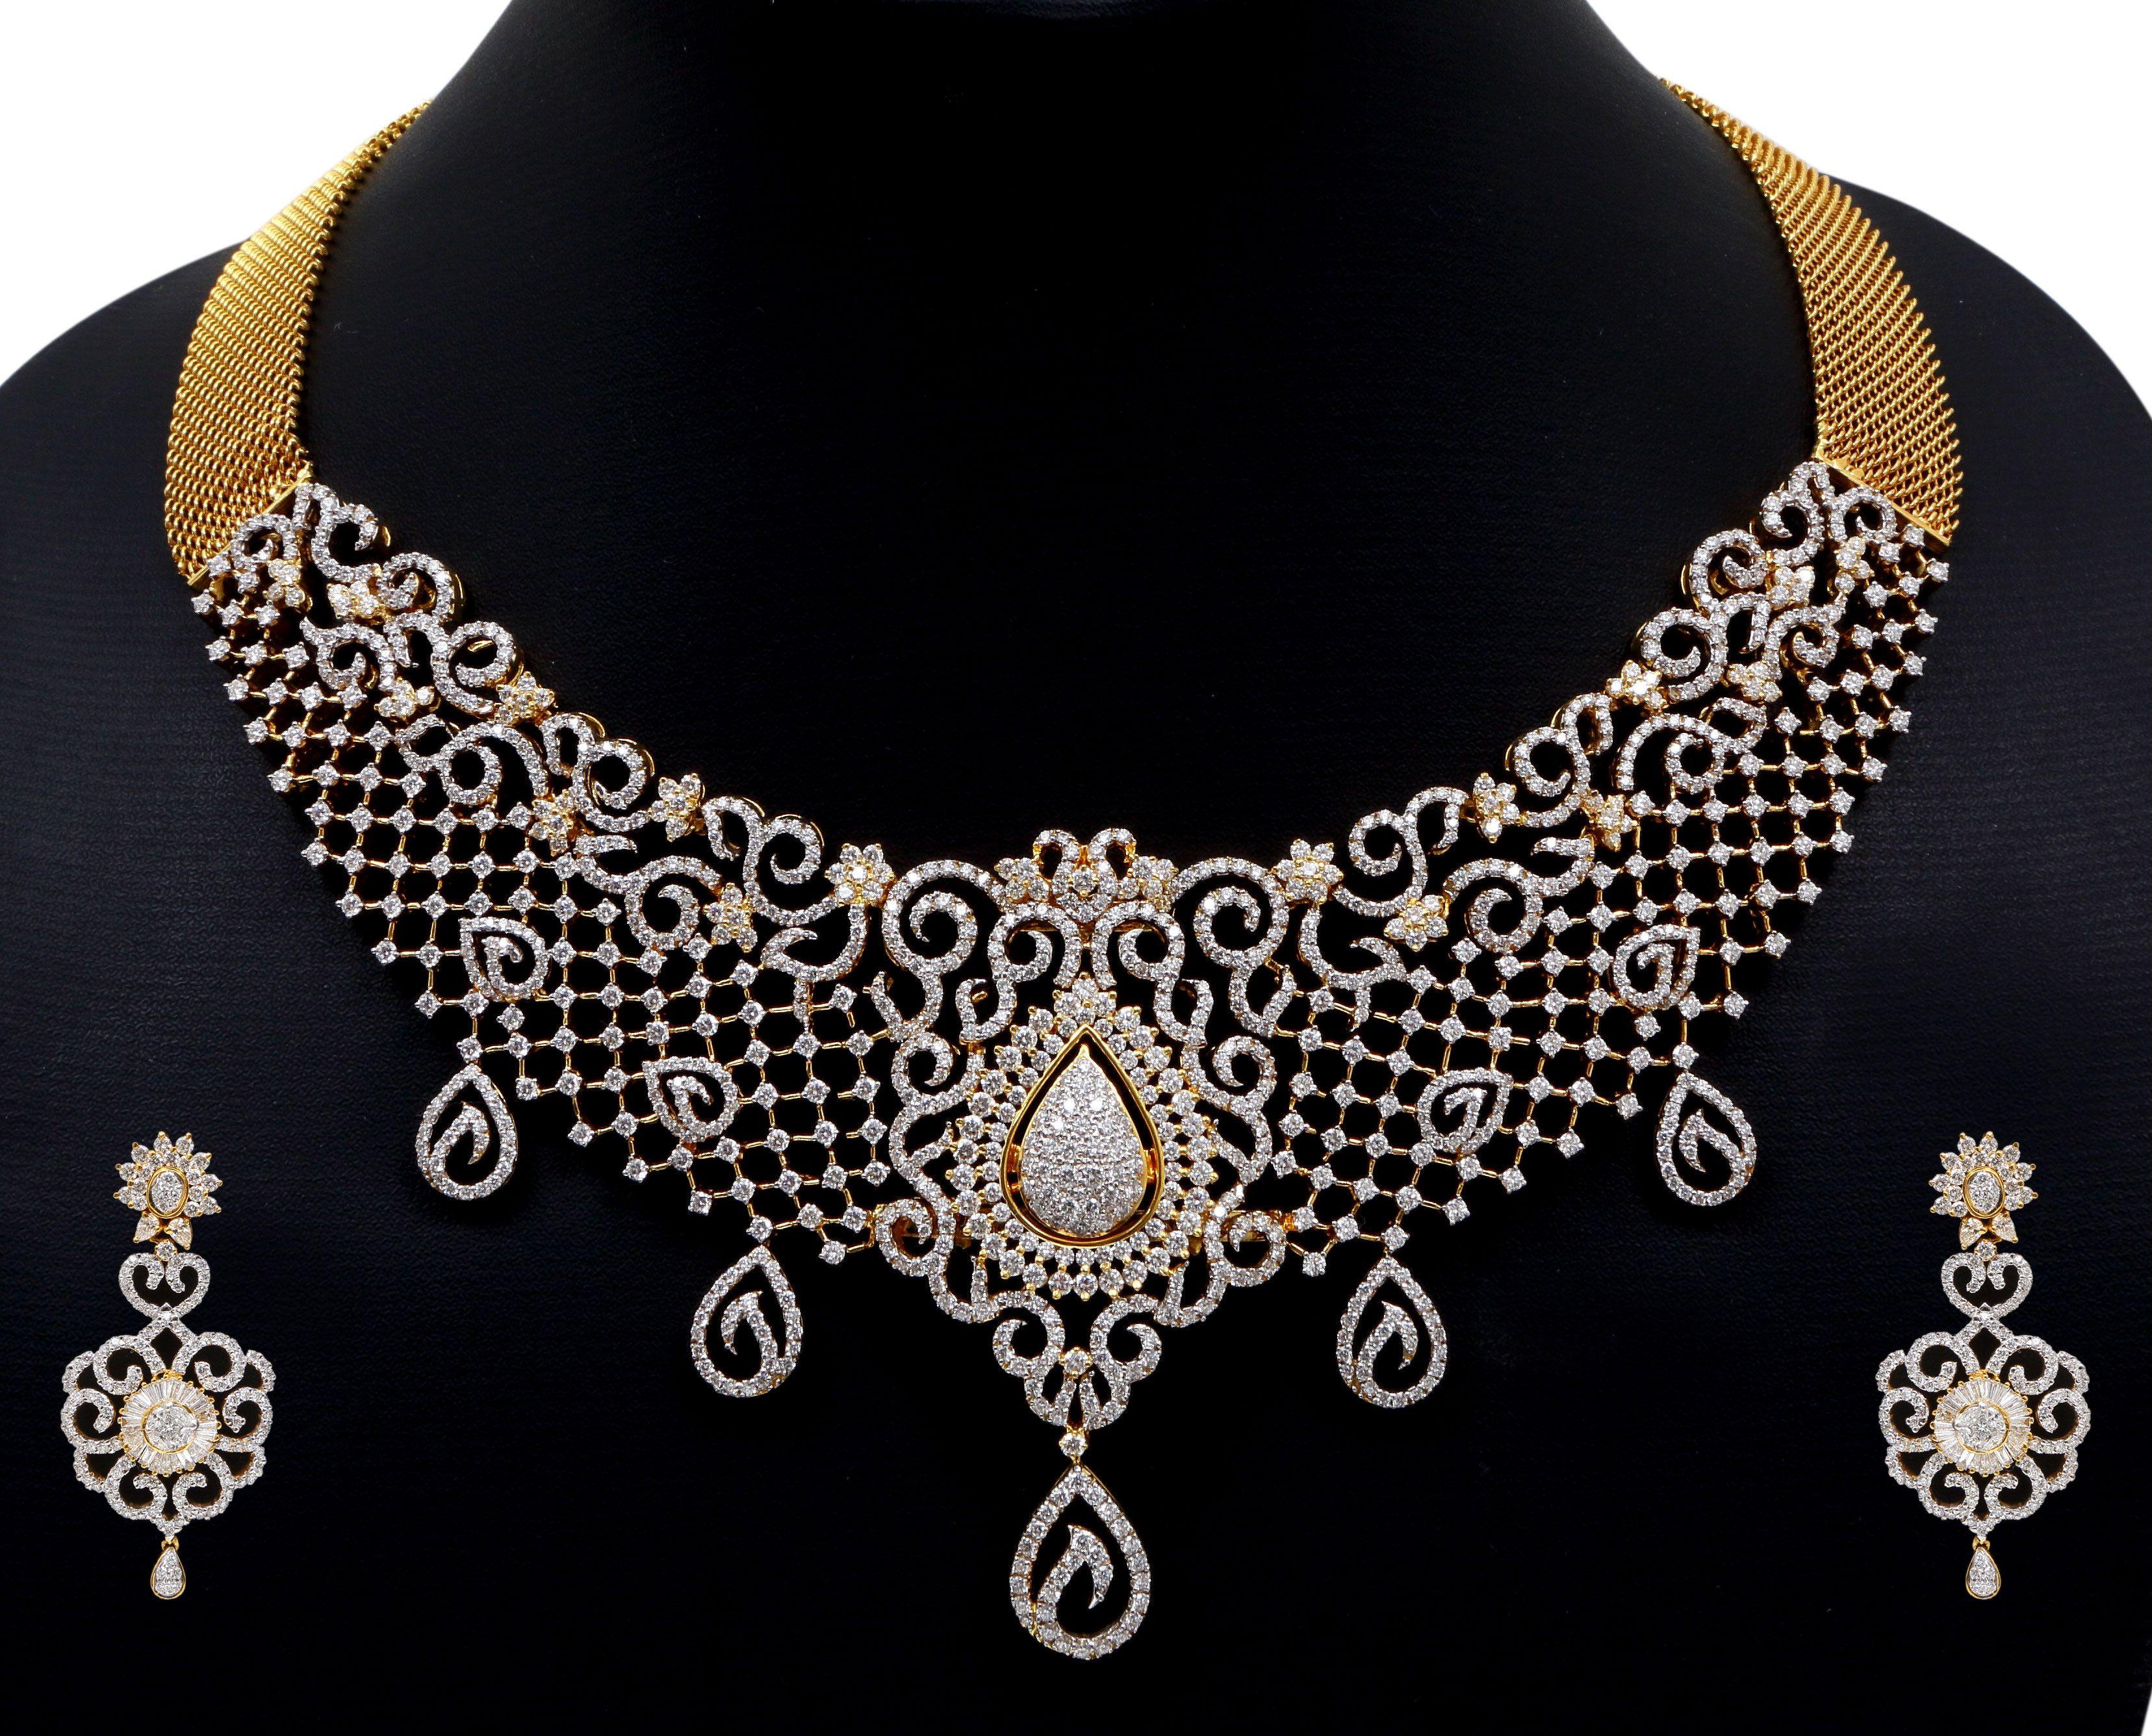 indian diamond necklacesdiamond necklace set indian diamond necklace designs zcyhbve jewels